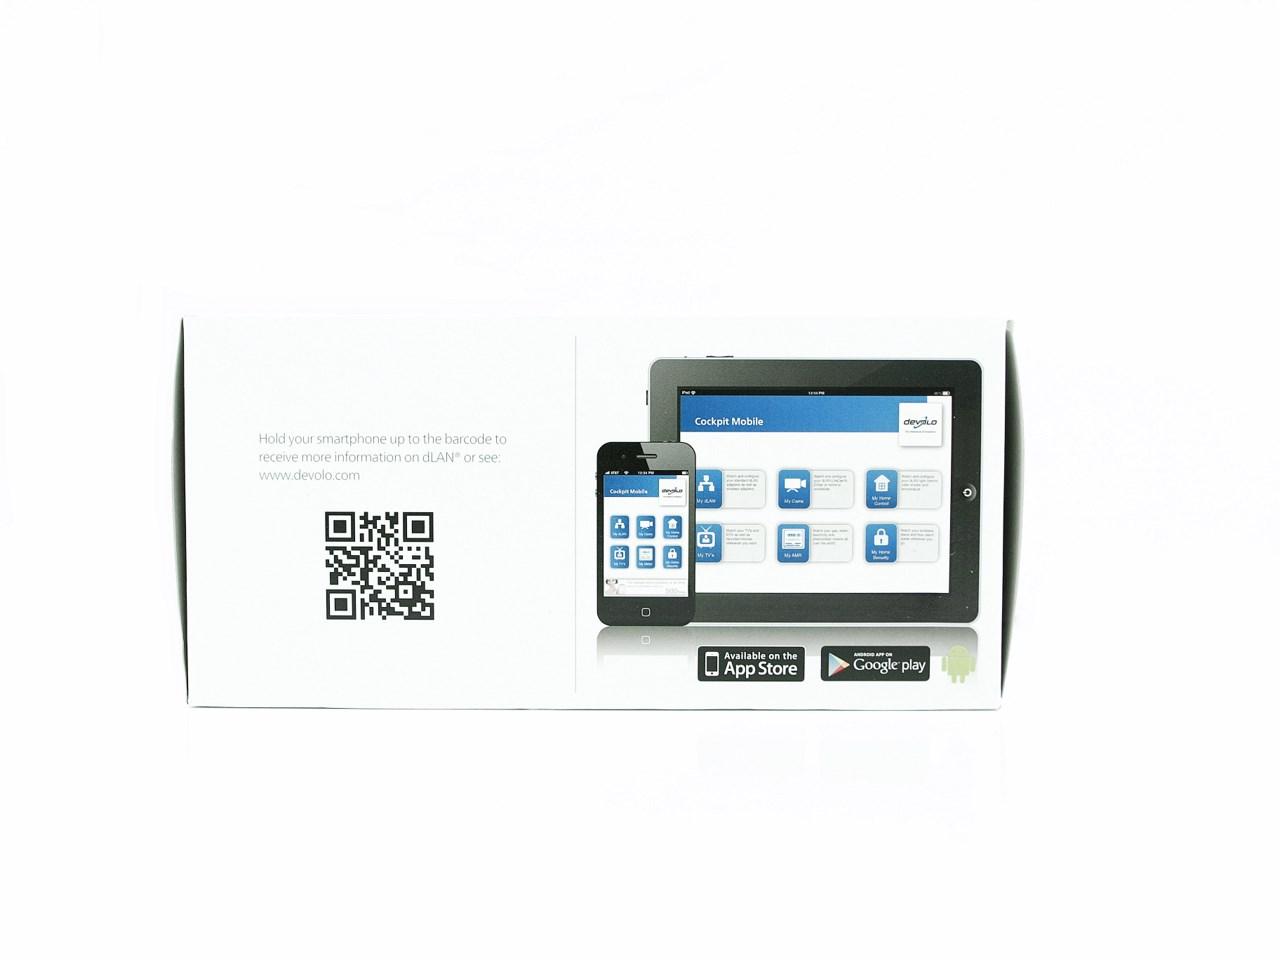 Devolo Dlan Livecam Starter Kit Review